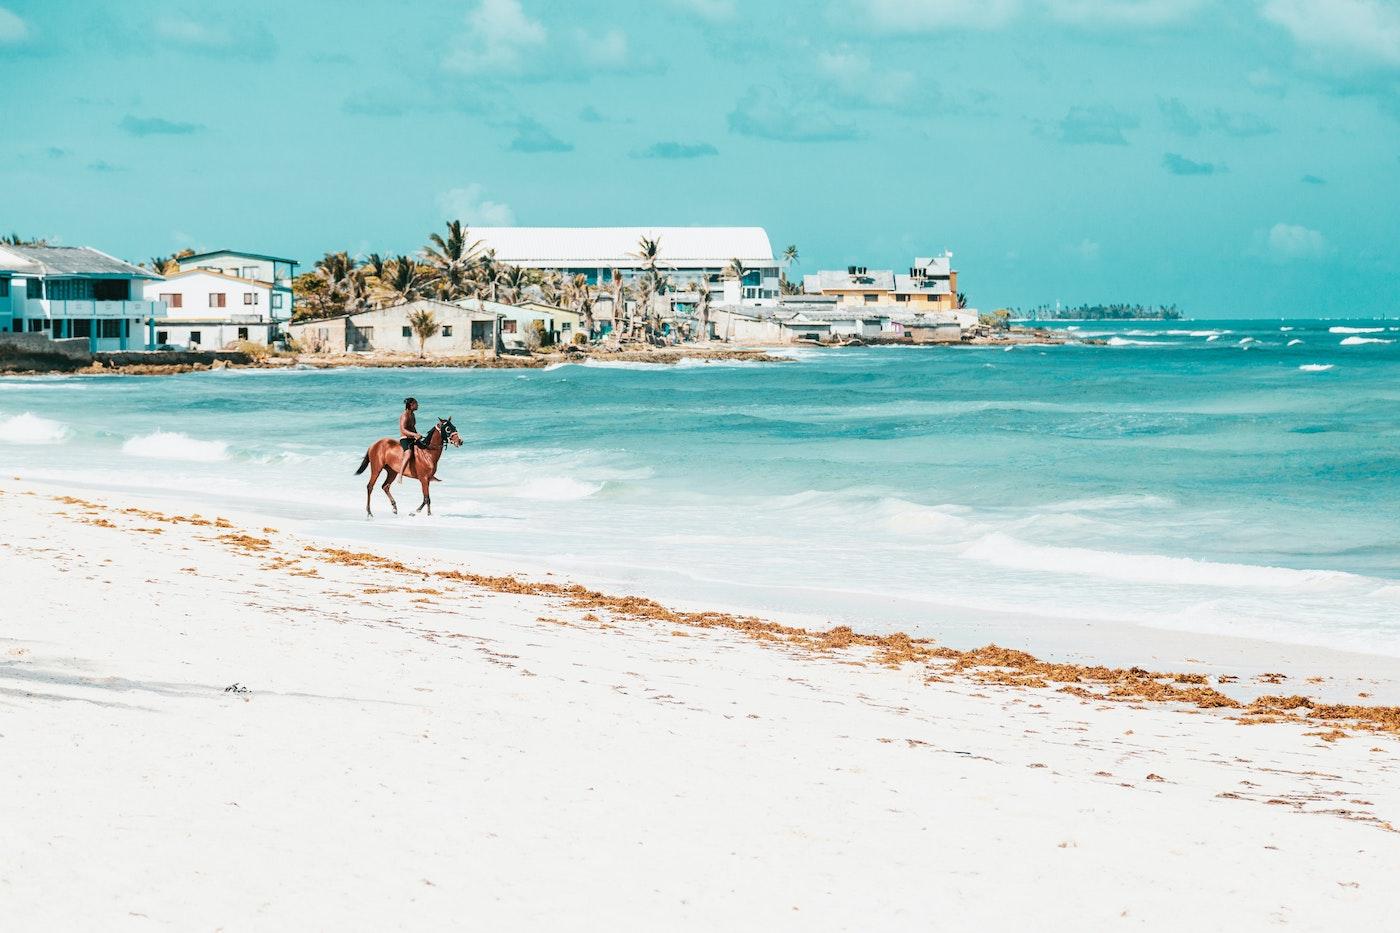 ARUBA Caribbean Eindrücke vom Strand